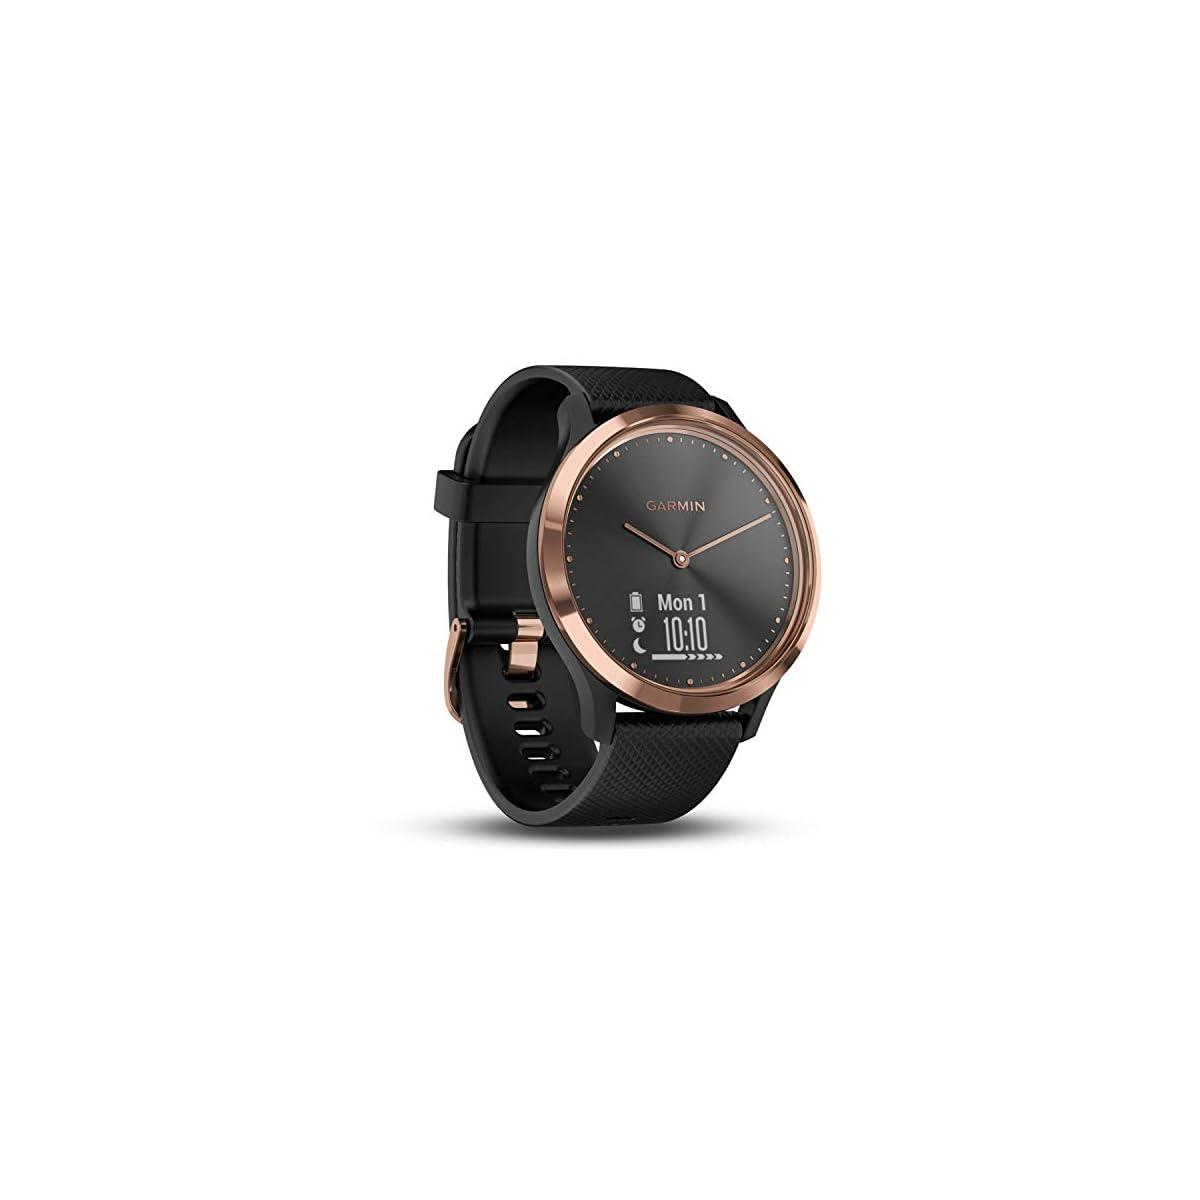 41BYH4XiwAL. SS1200  - Garmin Vívomove HR-   Reloj híbrido con pantalla oculta y agujas,  correa de silicona negra